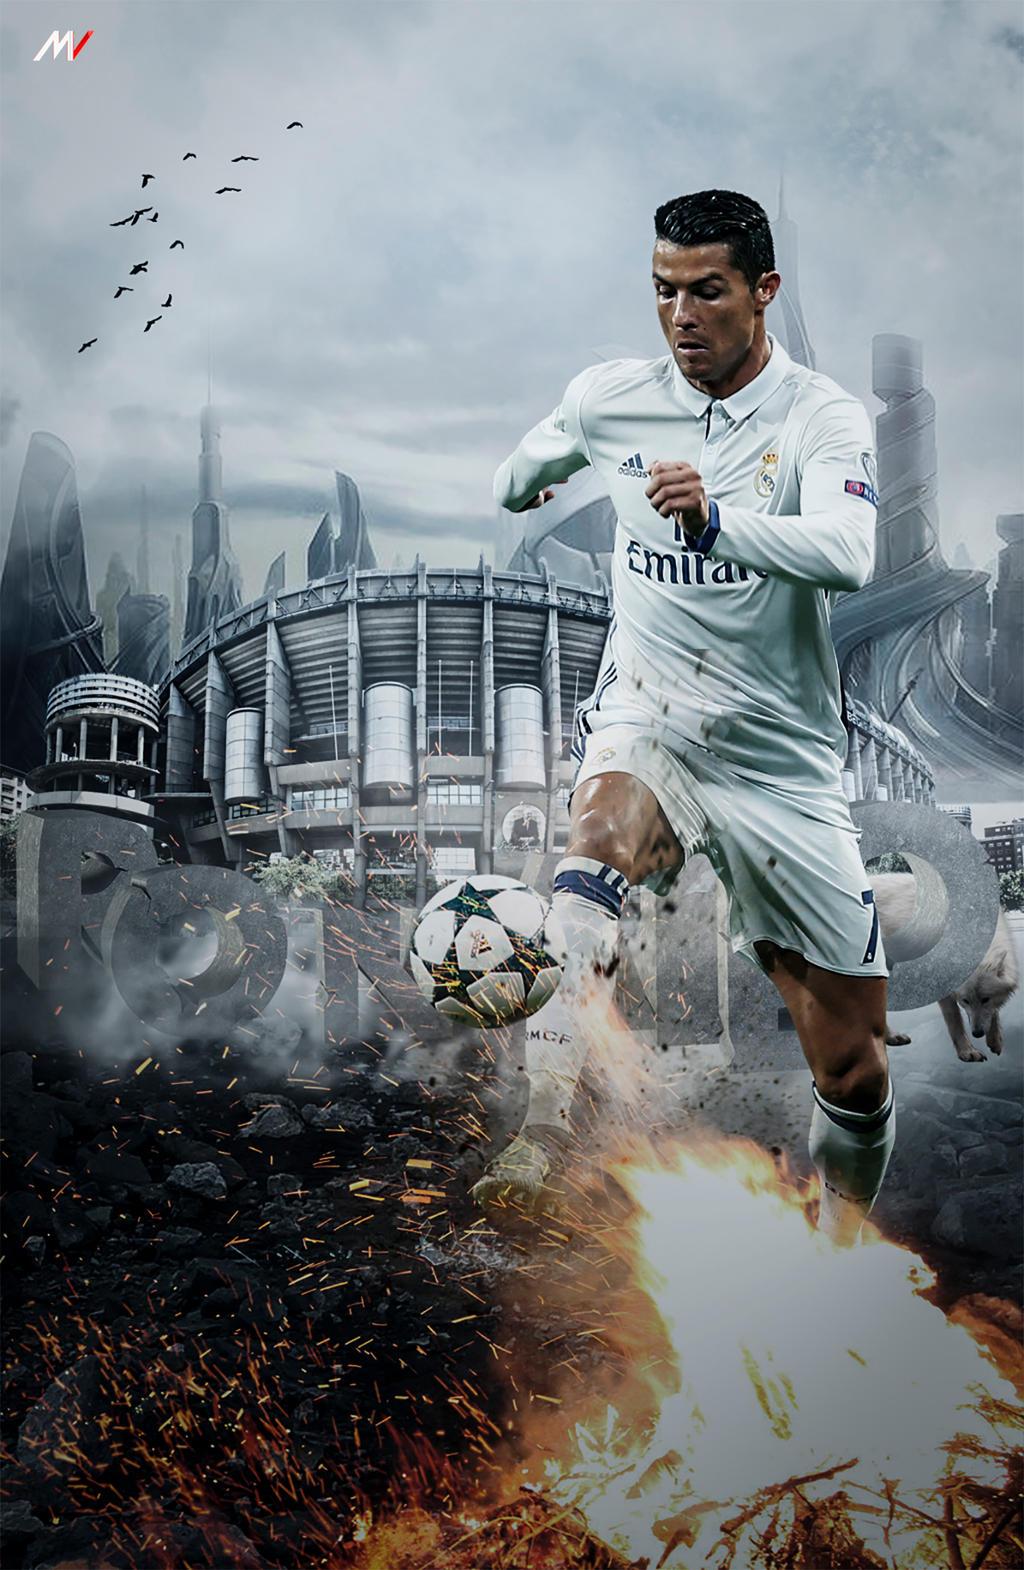 Cristiano Ronaldo Wallpaper 2016 by ShibilyMV7 on DeviantArt